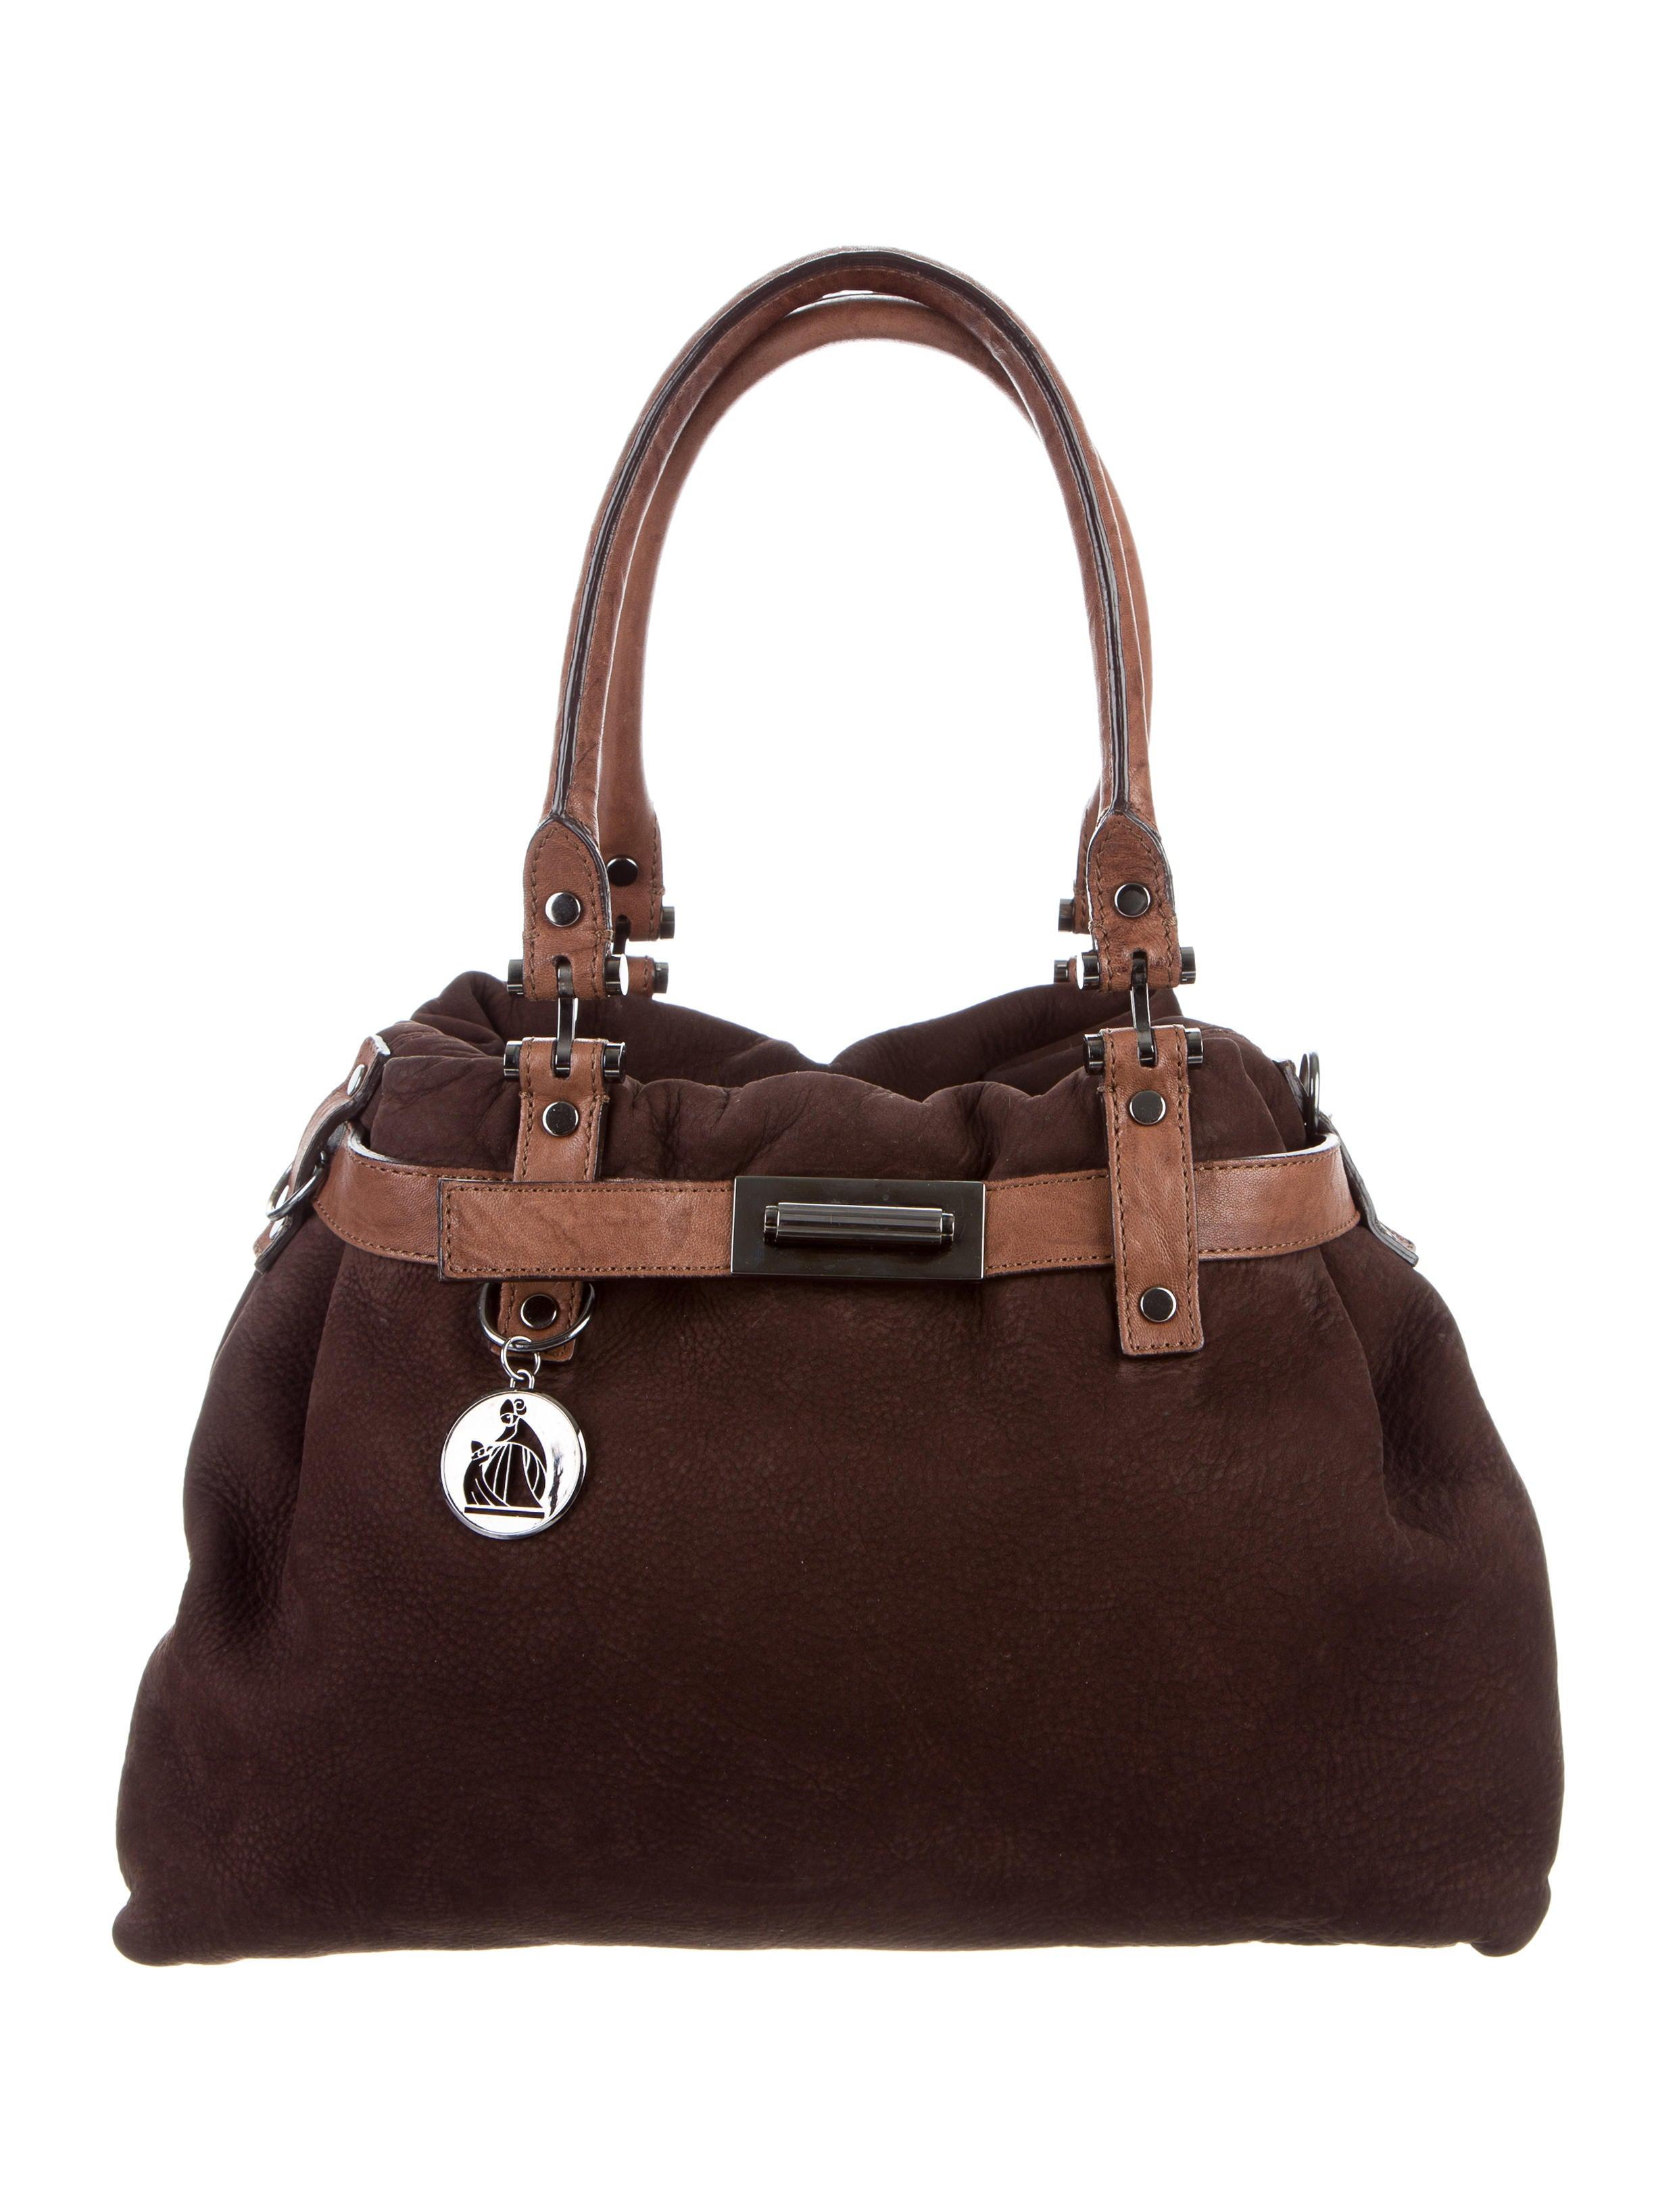 Lanvin Leather Kentucky Satchel Handbags LAN61648  : LAN616481enlarged from www.therealreal.com size 2481 x 3273 jpeg 440kB